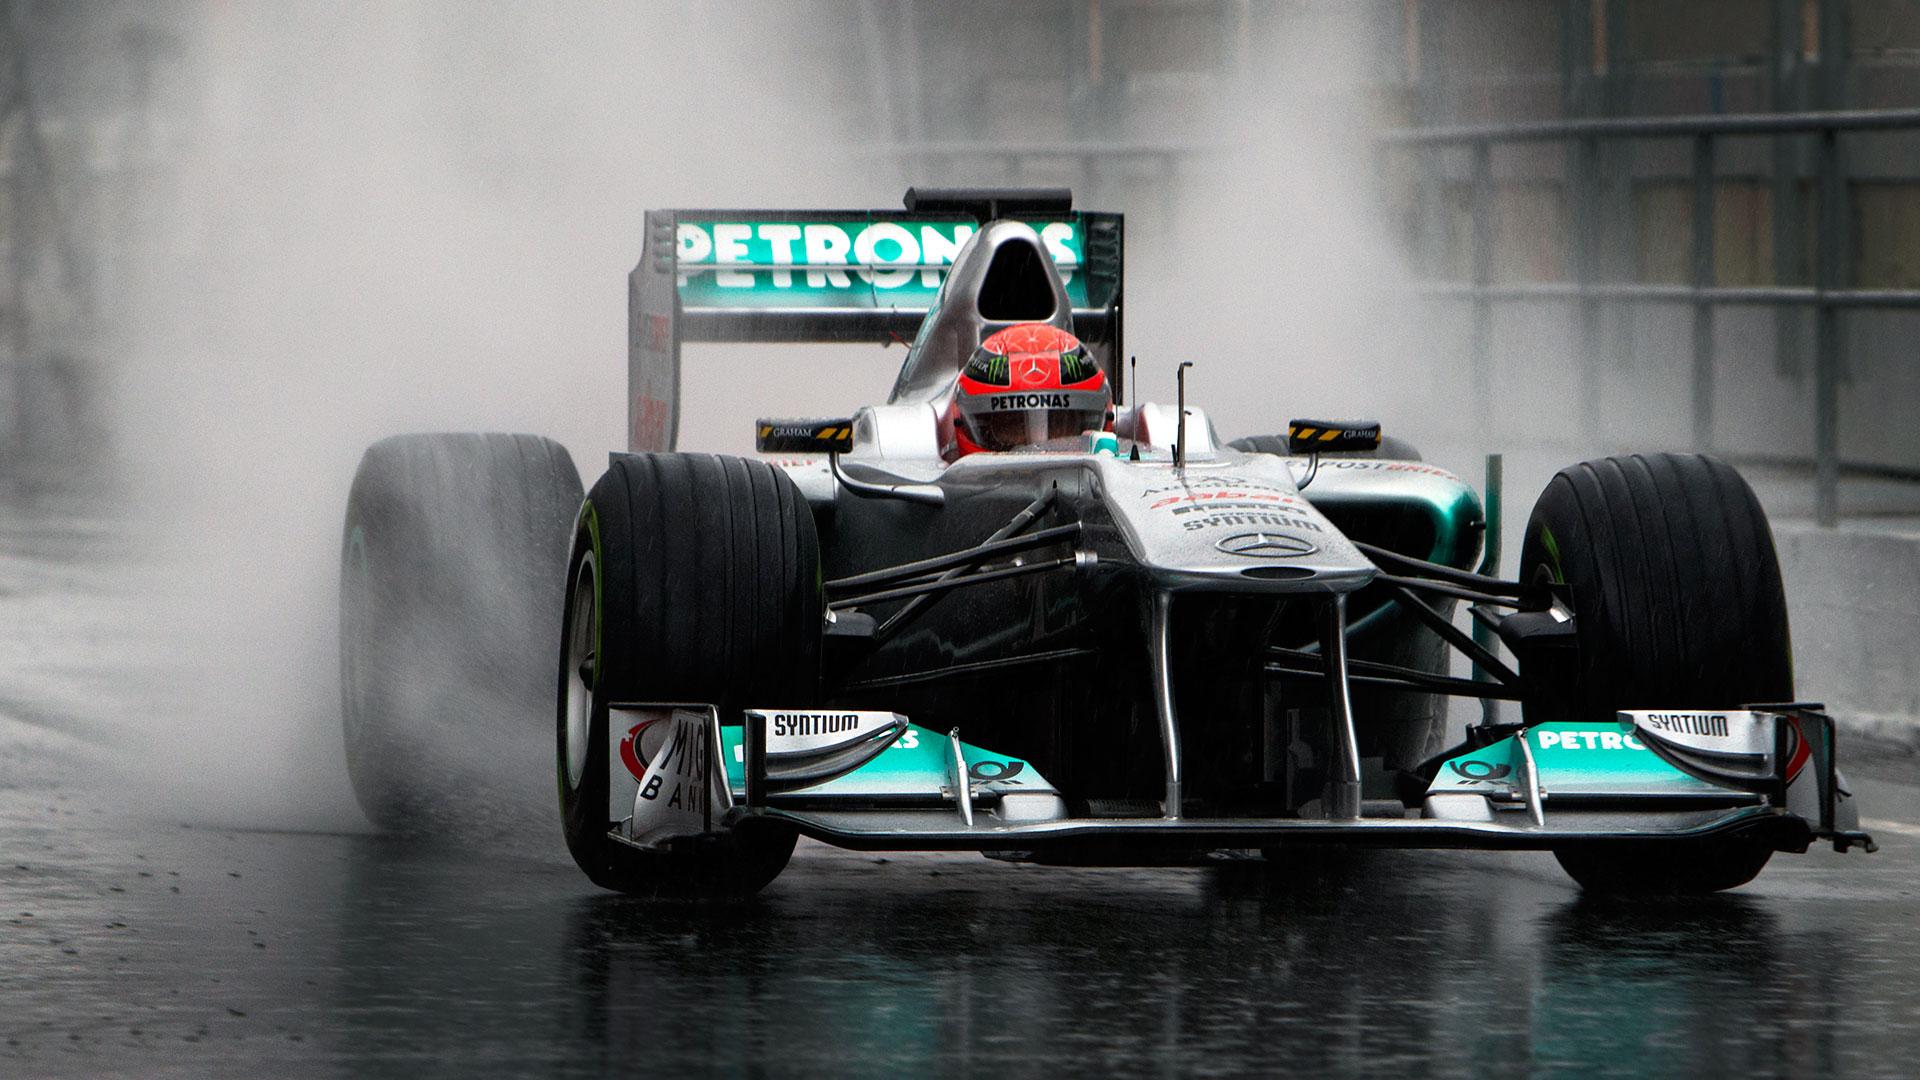 Schumacher Mercedes F1 Full Hd Wallpaper: HD Wallpapers 2011 Testing Formula 1 Cars